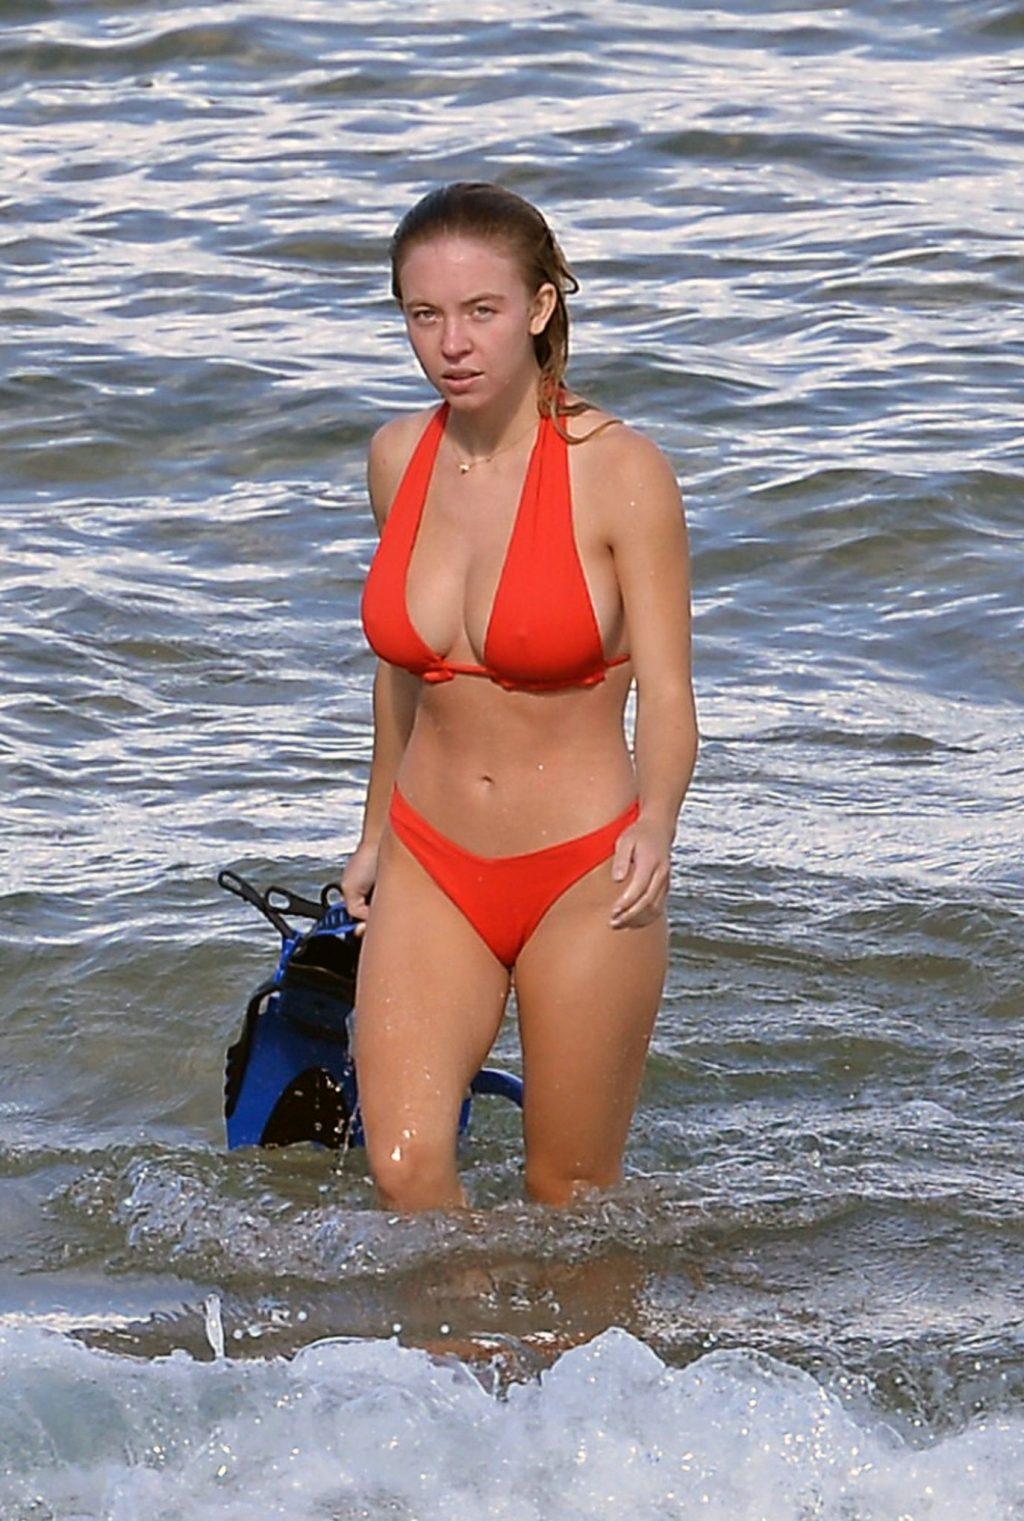 Sydney Sweeney tits